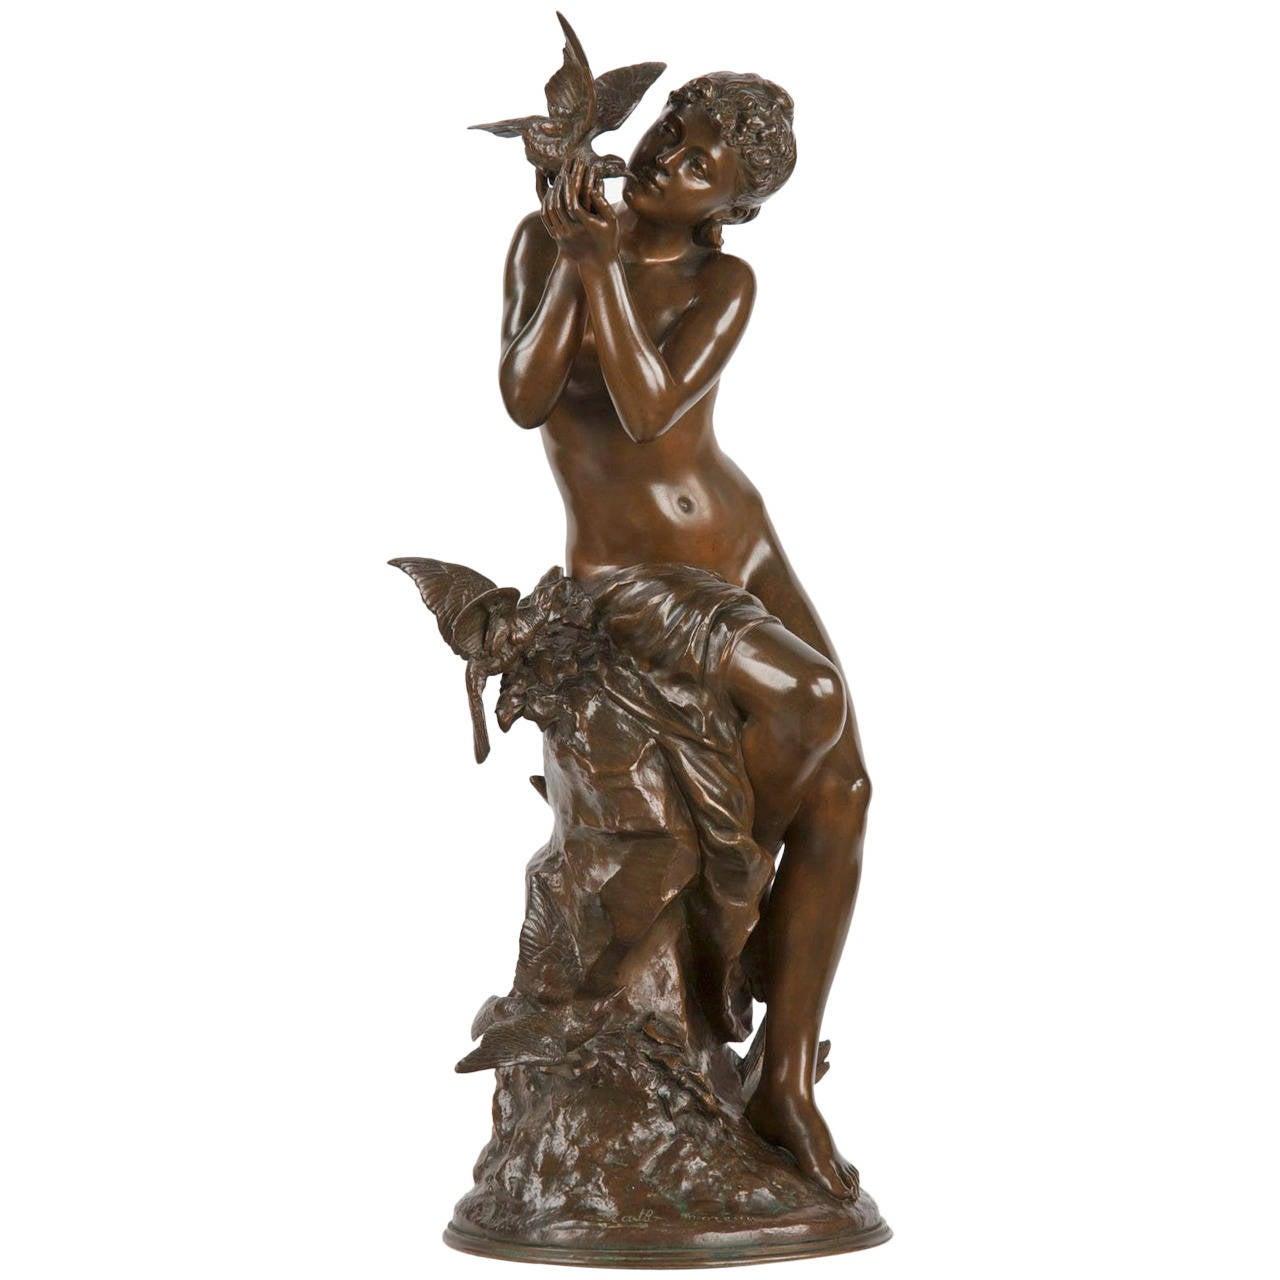 mathurin moreau art nouveau bronze sculpture of seated maiden susse freres at 1stdibs. Black Bedroom Furniture Sets. Home Design Ideas